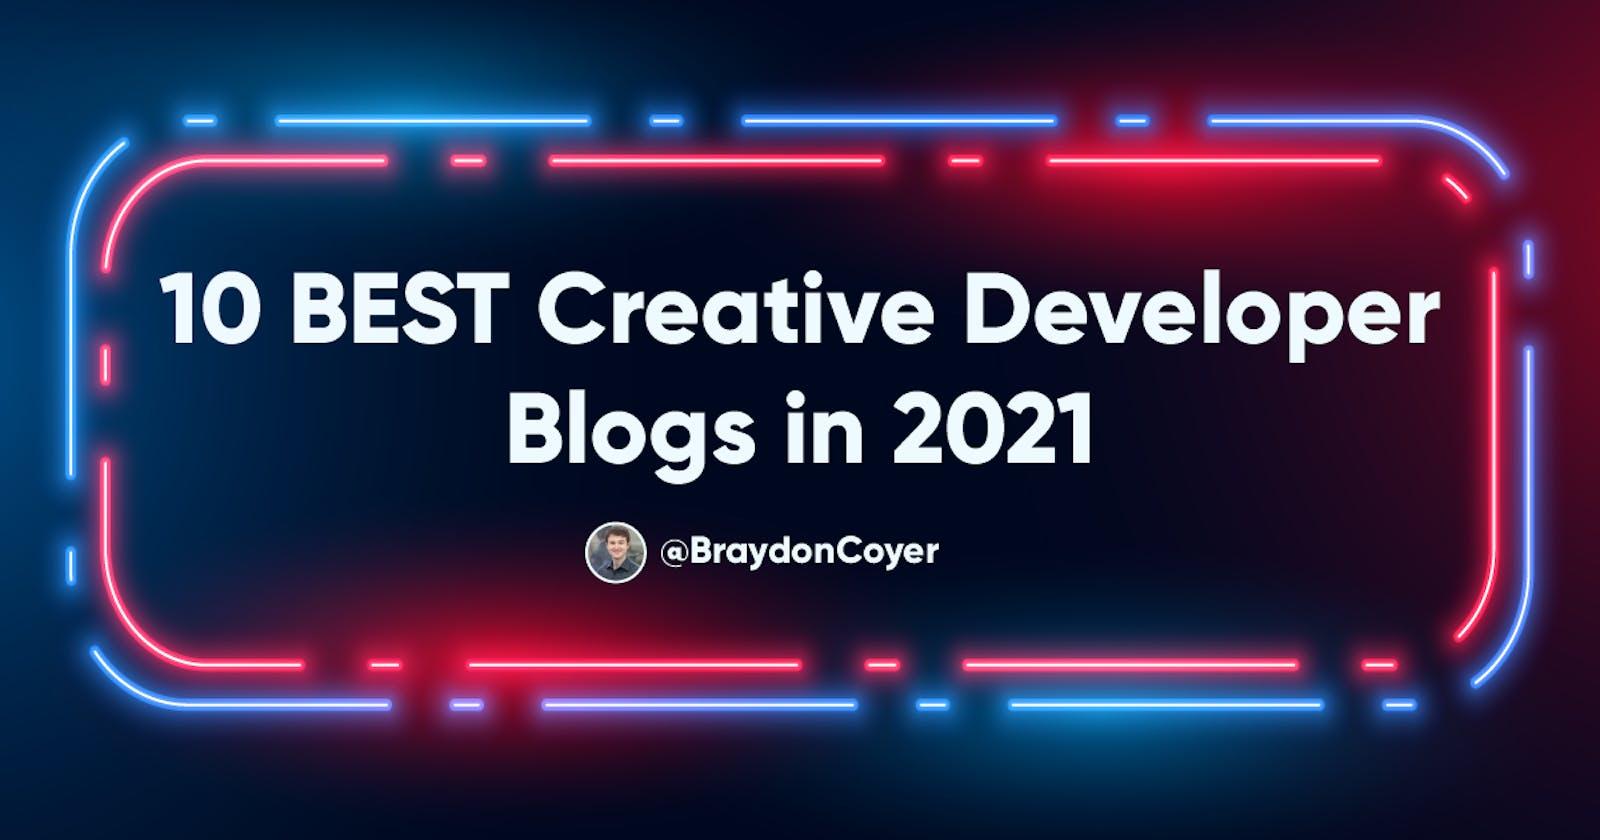 10 BEST Custom and Creative Developer Blogs in 2021